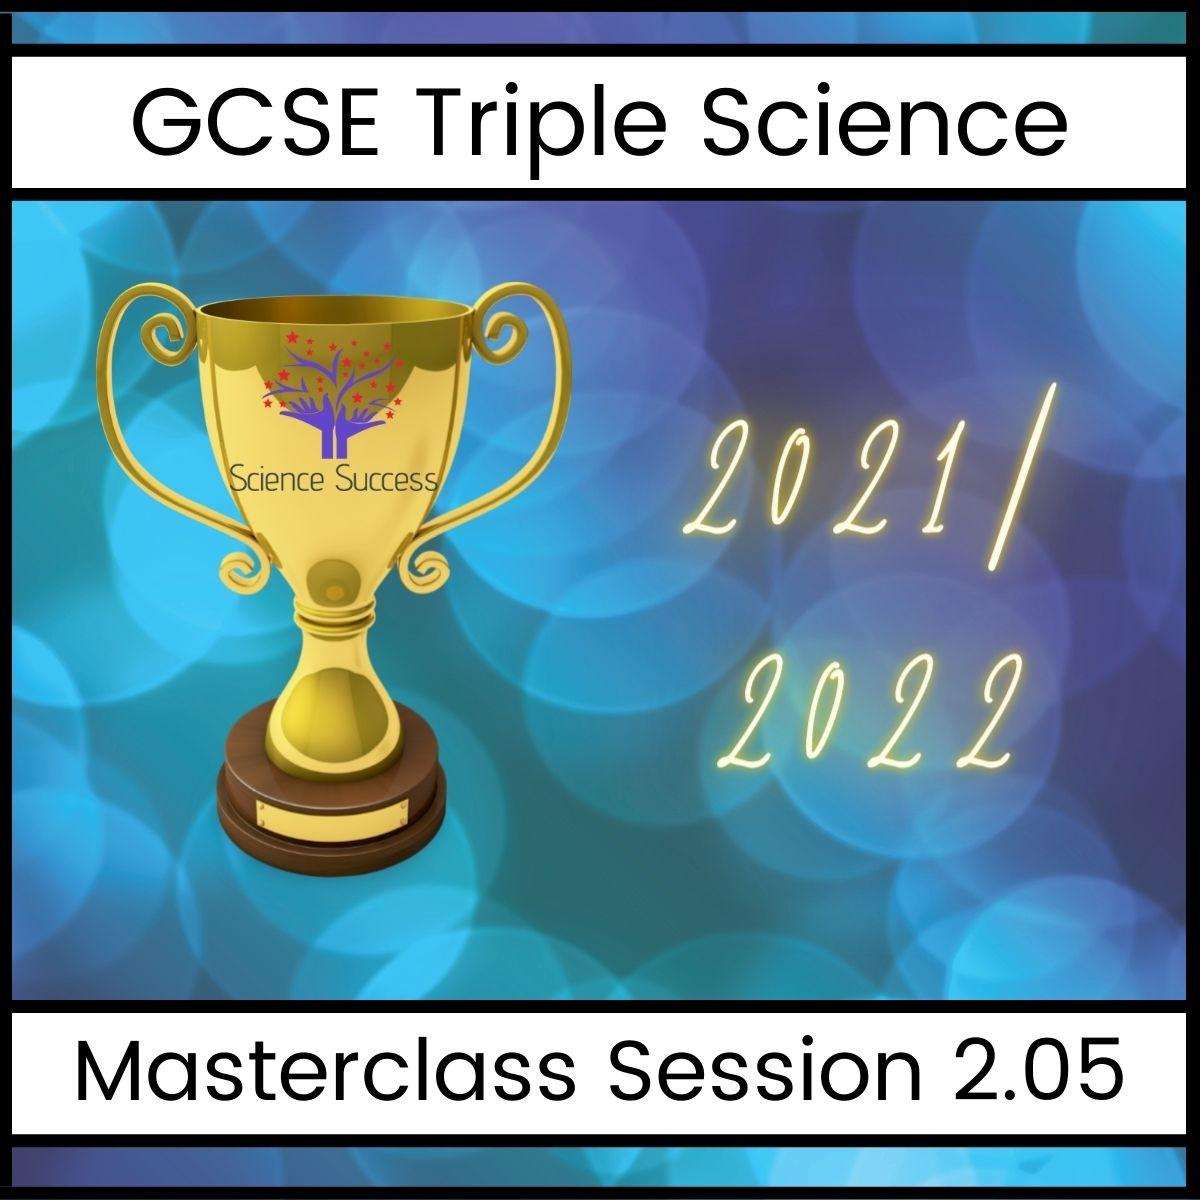 2.05 T 202122